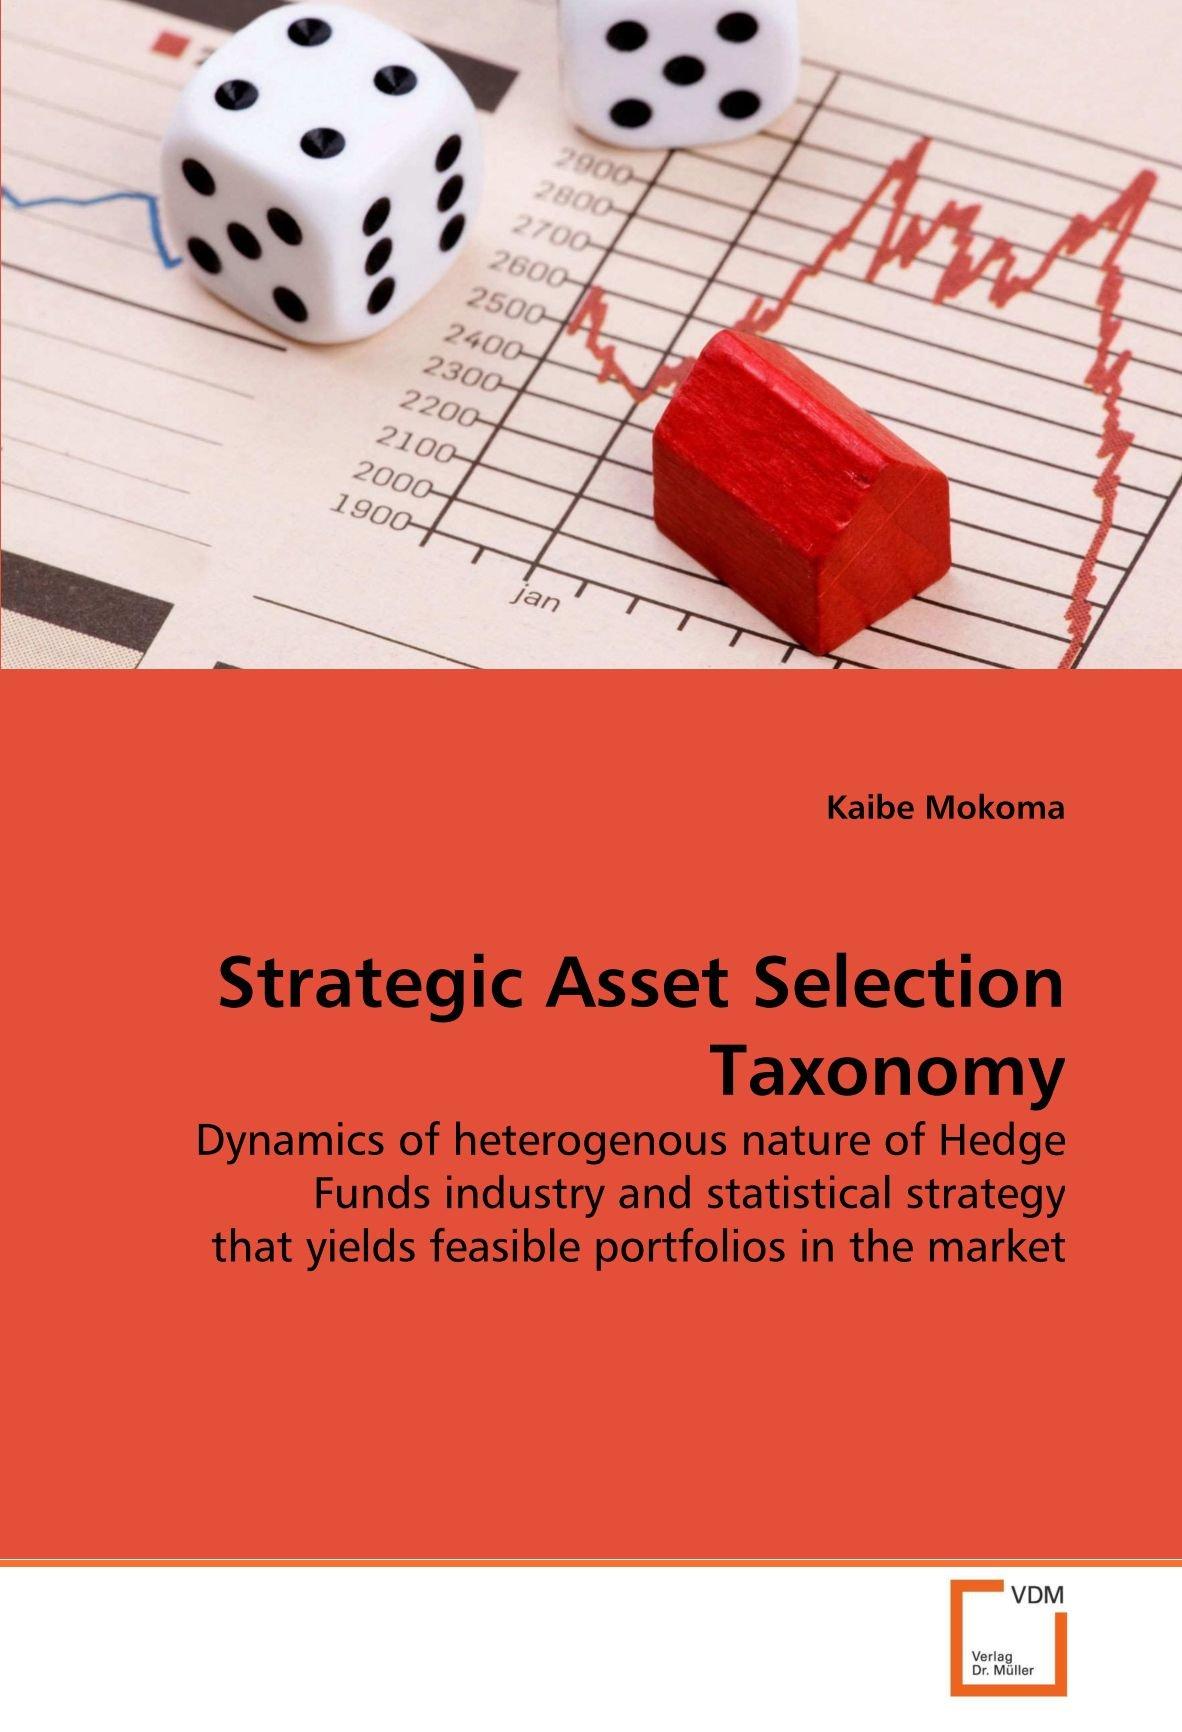 Strategic Asset Selection Taxonomy: Dynamics of heterogenous